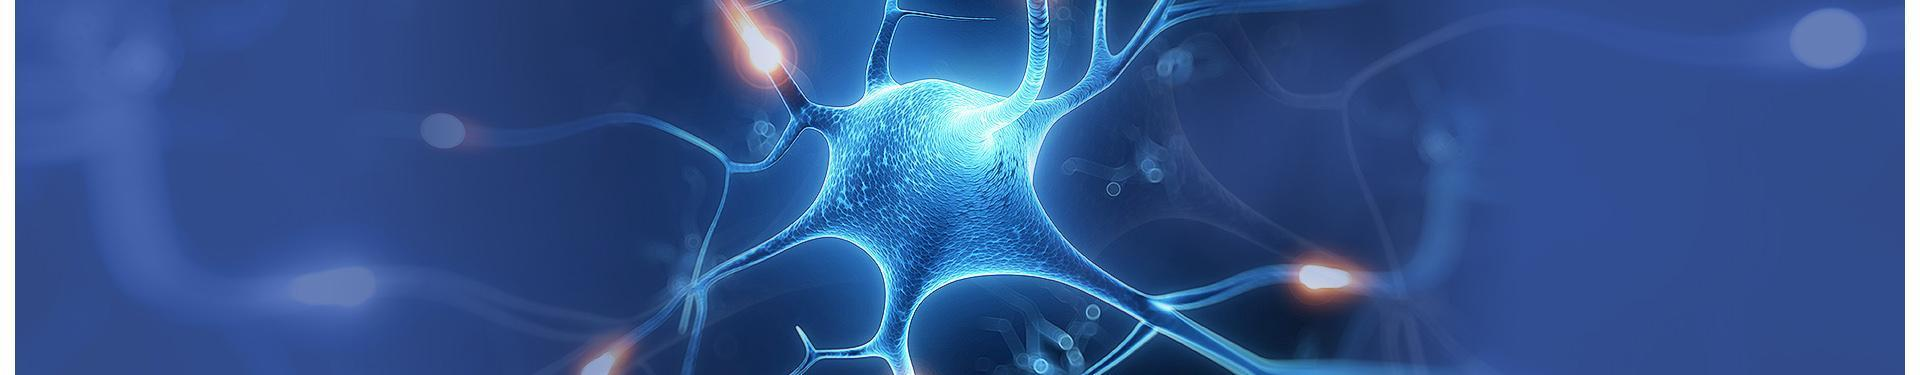 banner wizualizacja neuronu